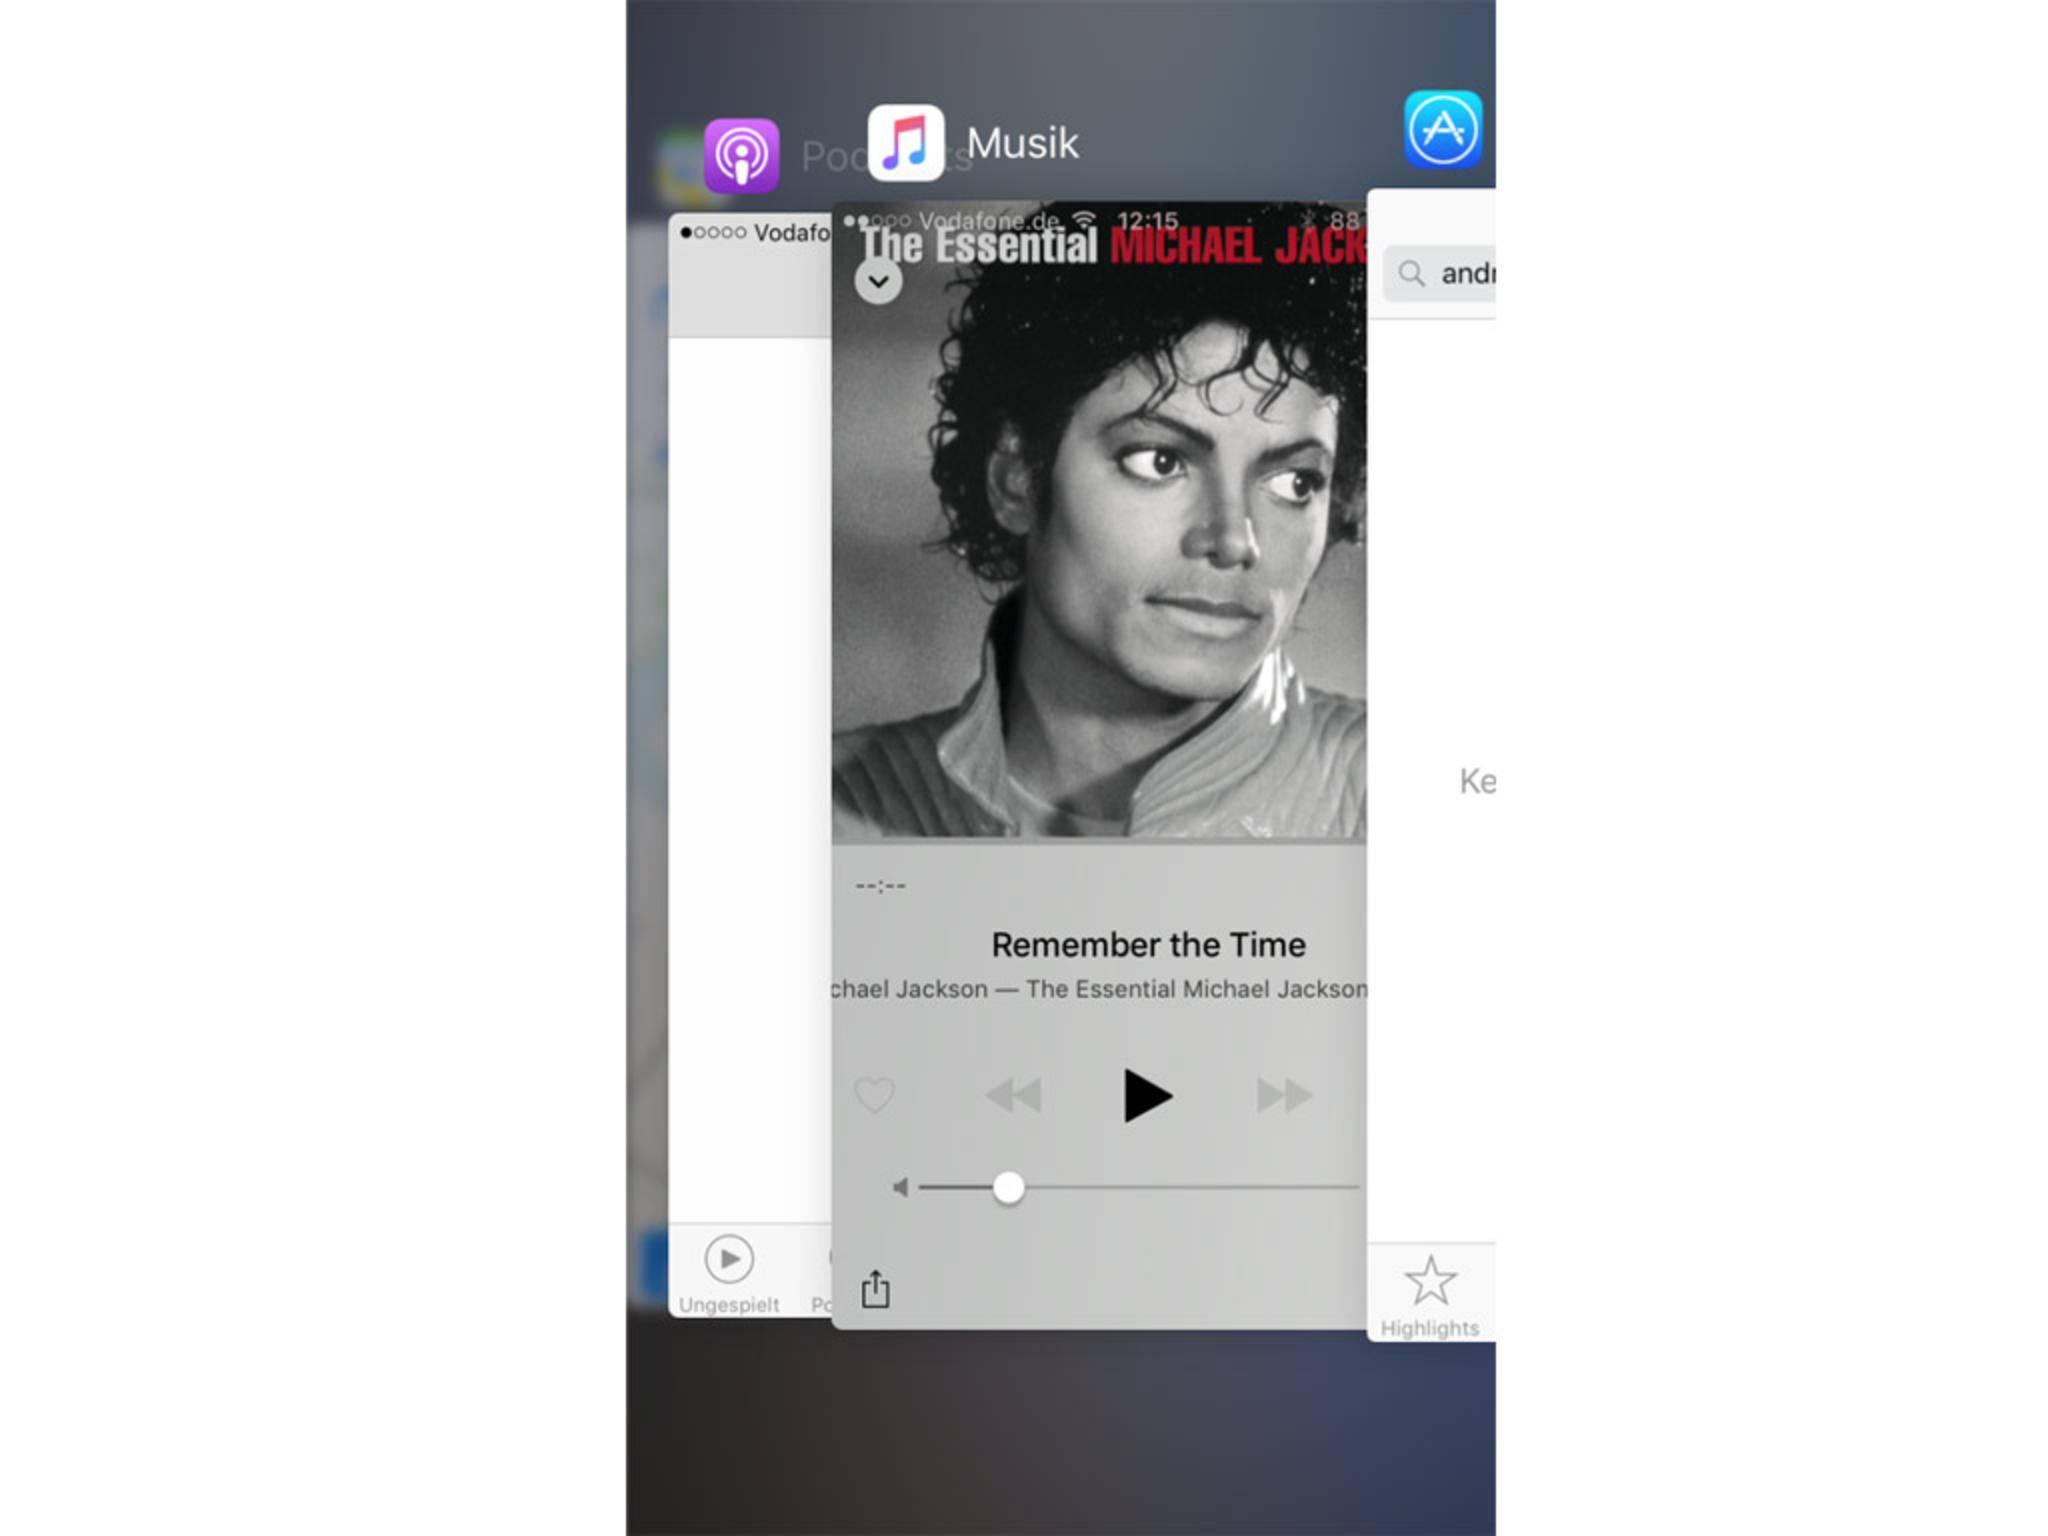 iOS9 Beta Home